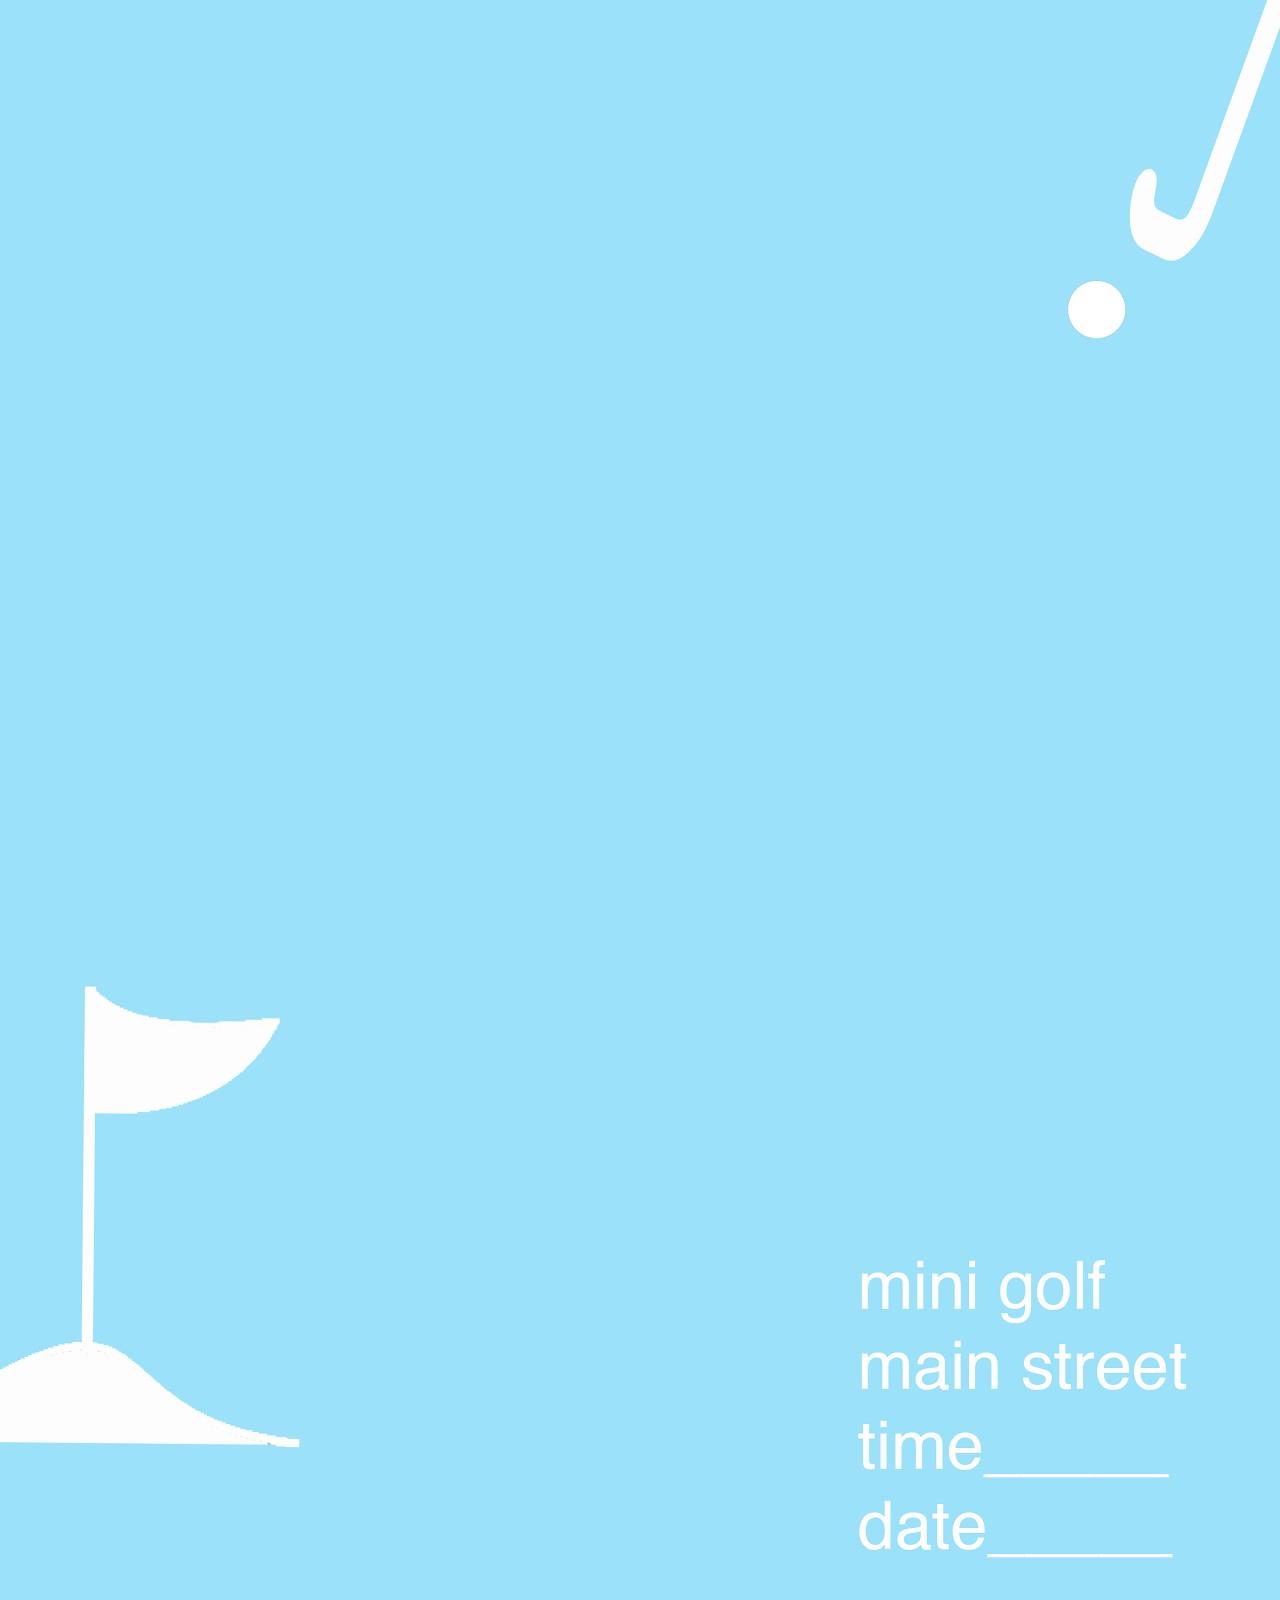 mini golf course design plans grosir baju surabaya